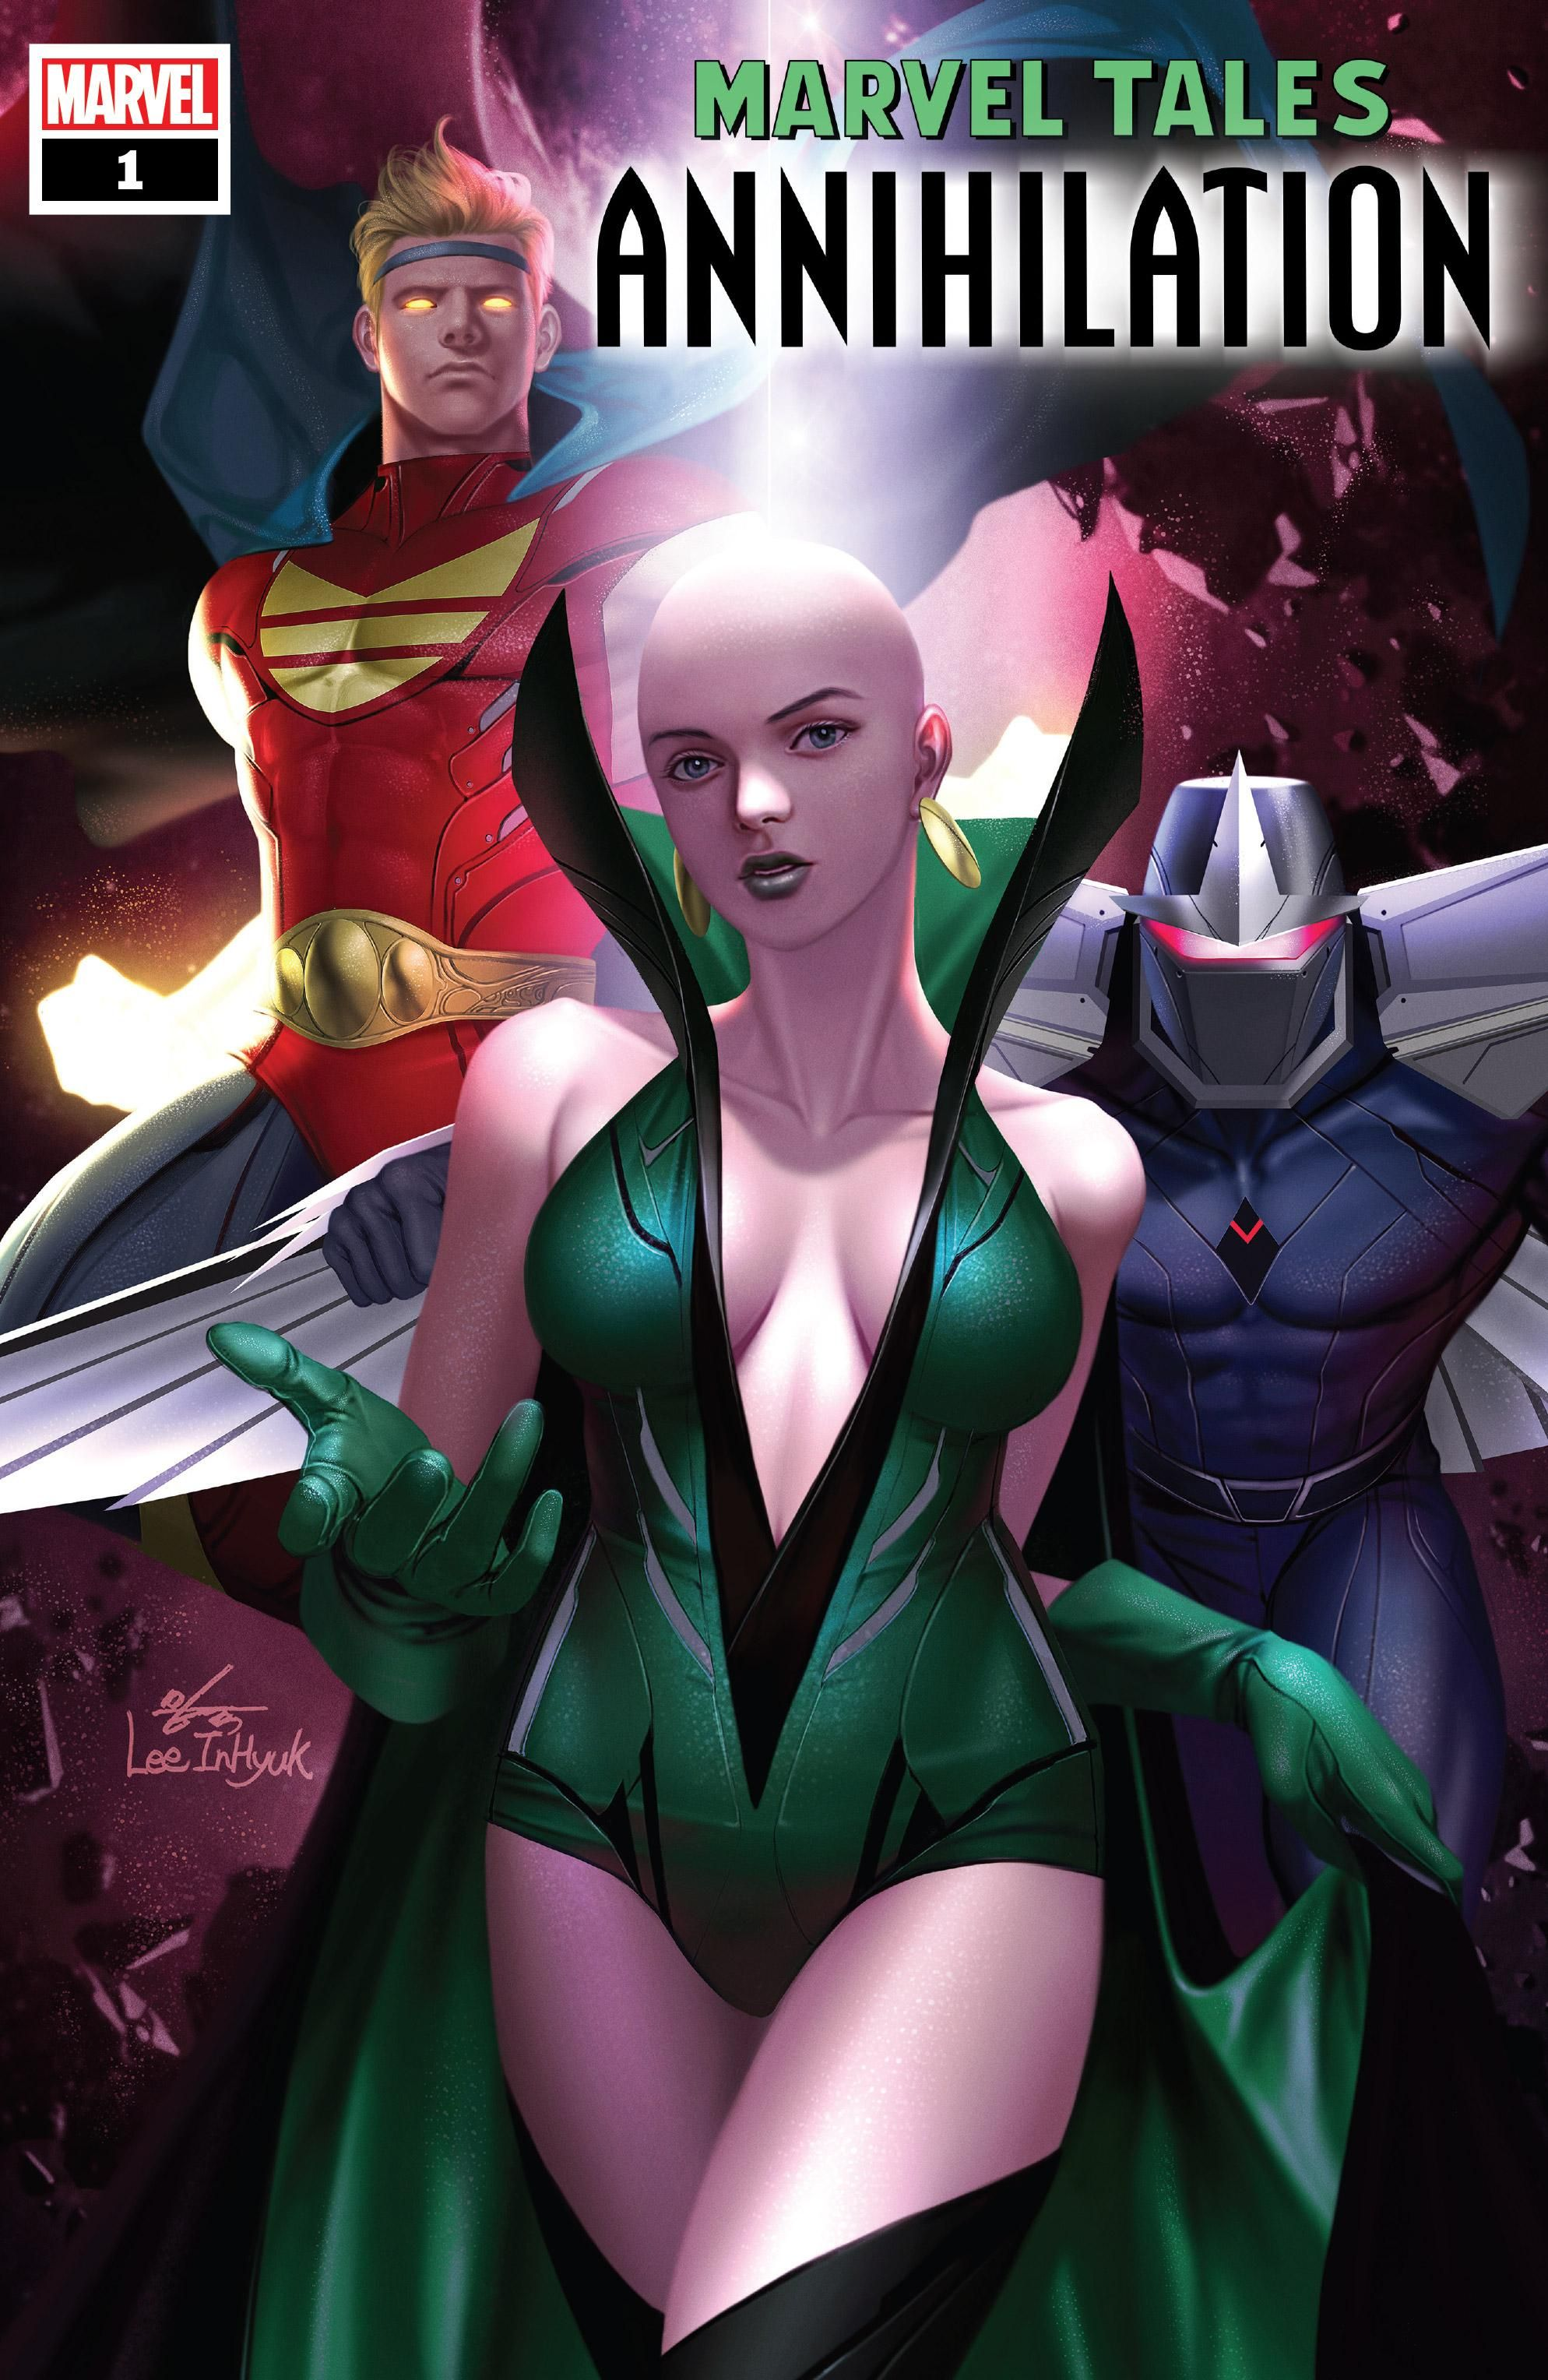 Marvel Tales: Annihilation Vol 1 1